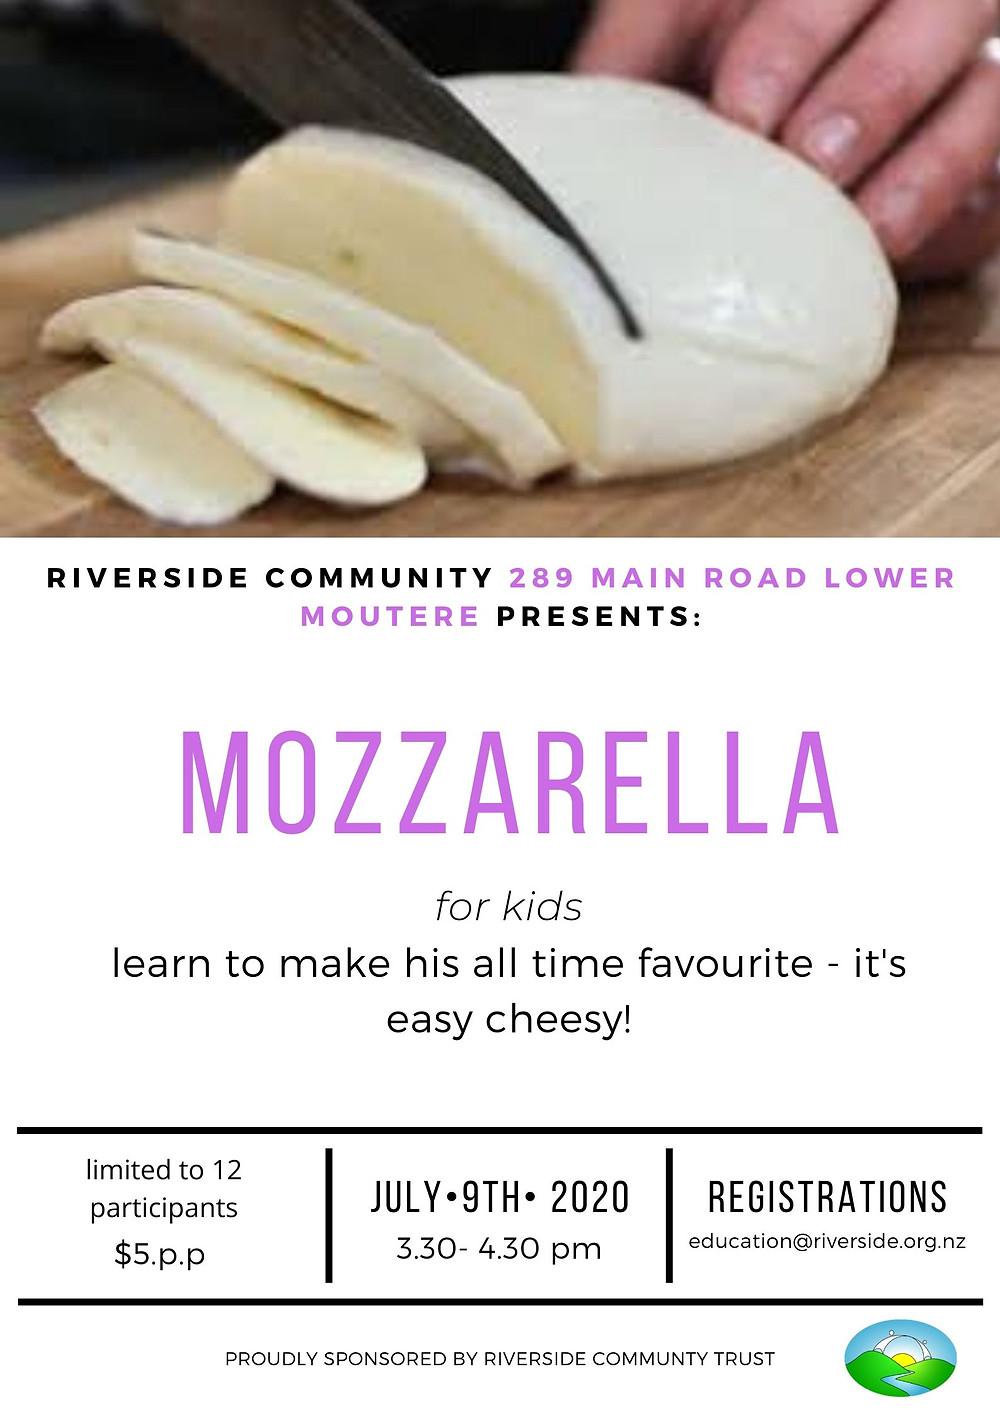 Mozarella Riverside